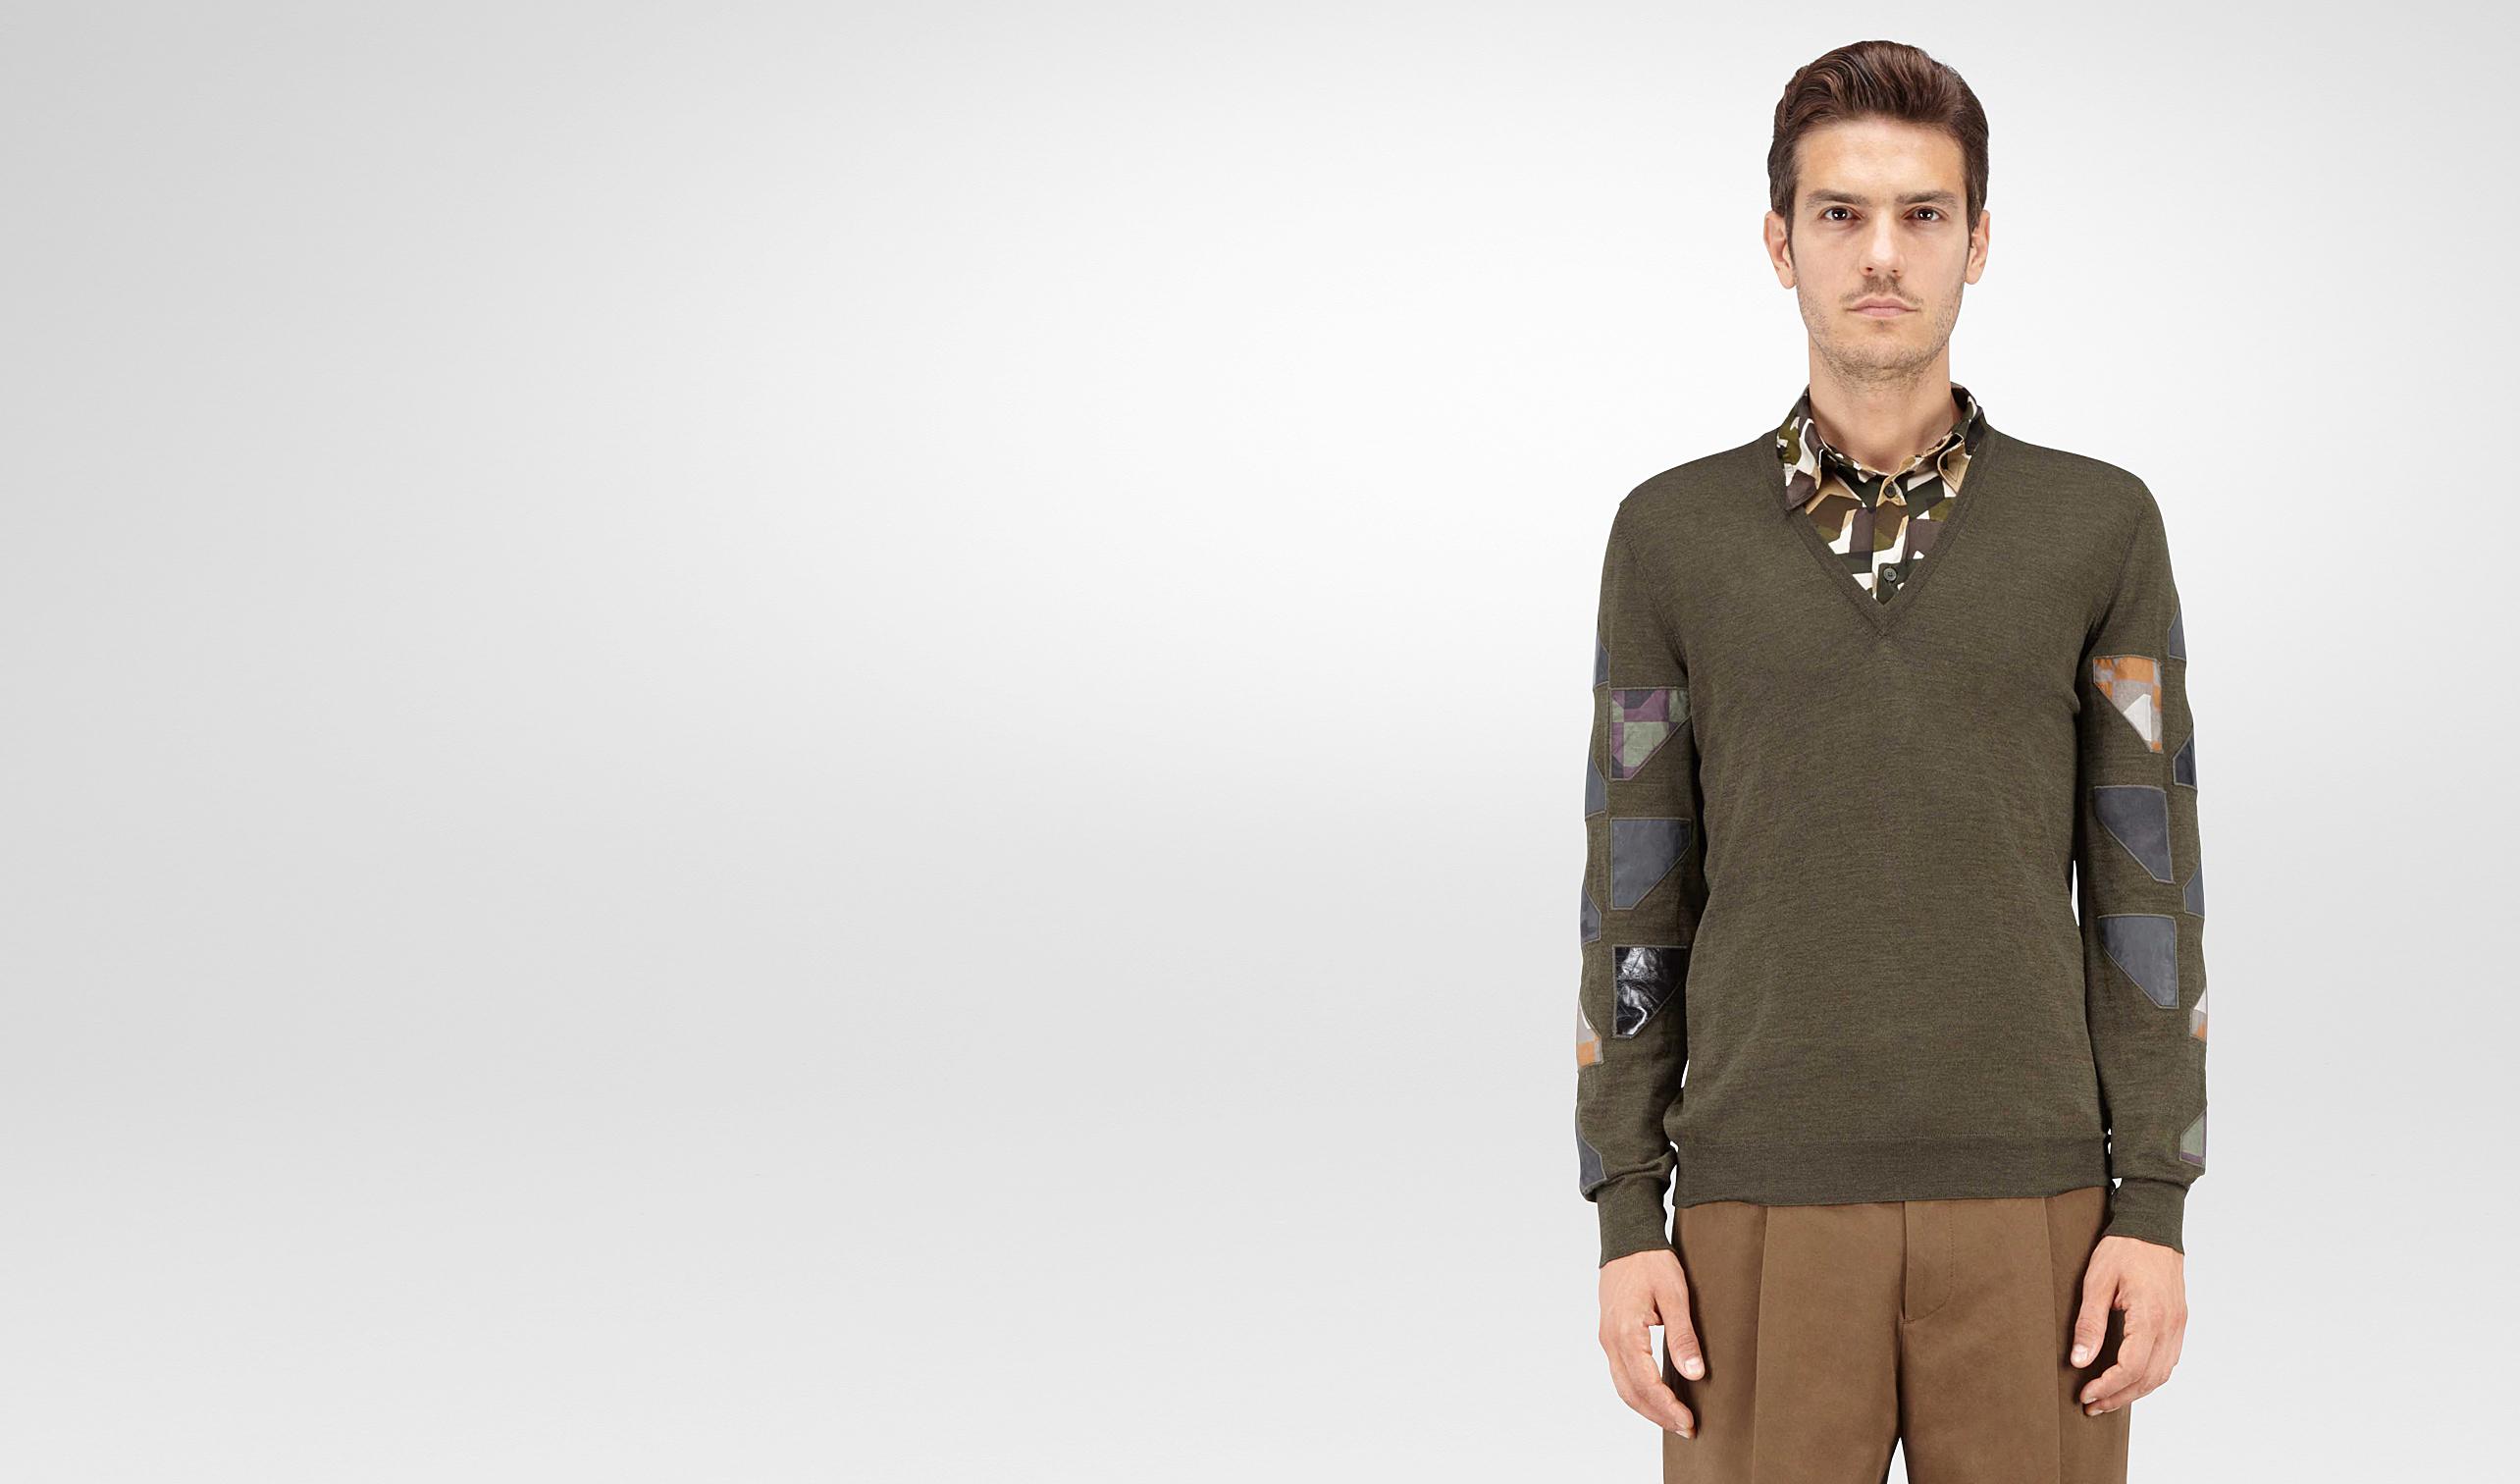 BOTTEGA VENETA Knitwear U SWEATER IN DARK SERGEANT MERINOS WOOL, EMBROIDERED PATCHWORK DETAILS pl